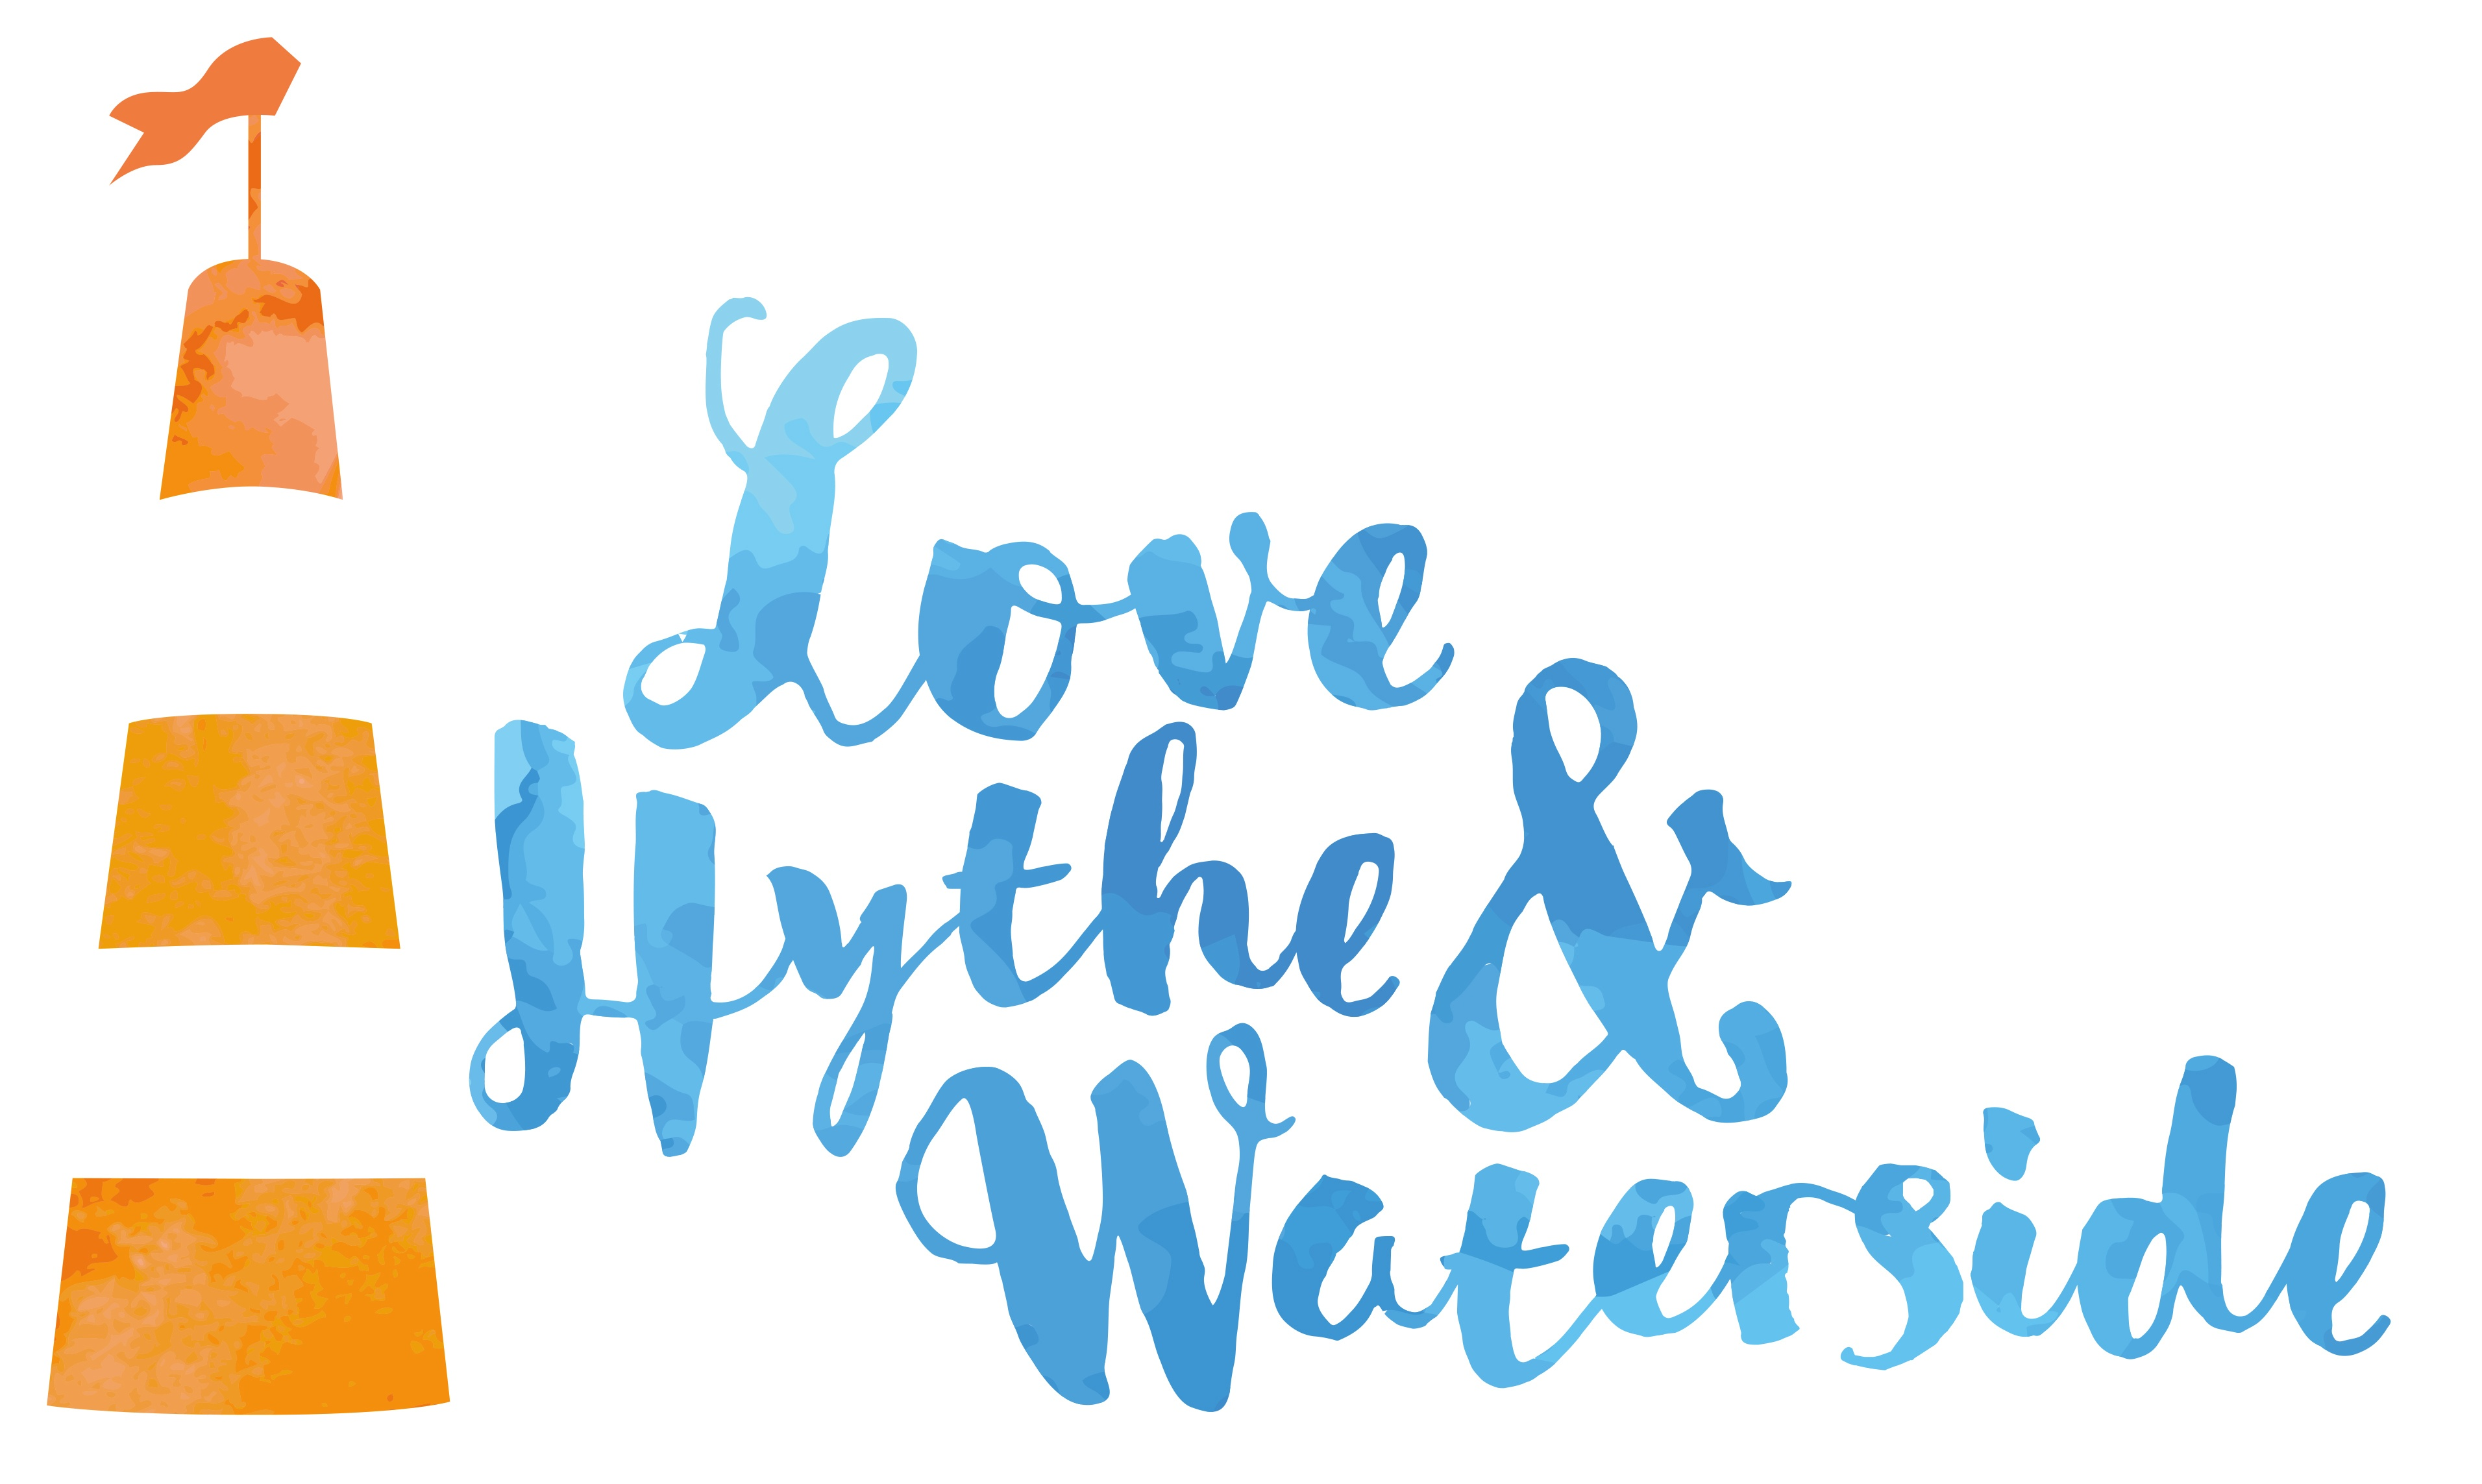 The Love Hythe & Waterside logo